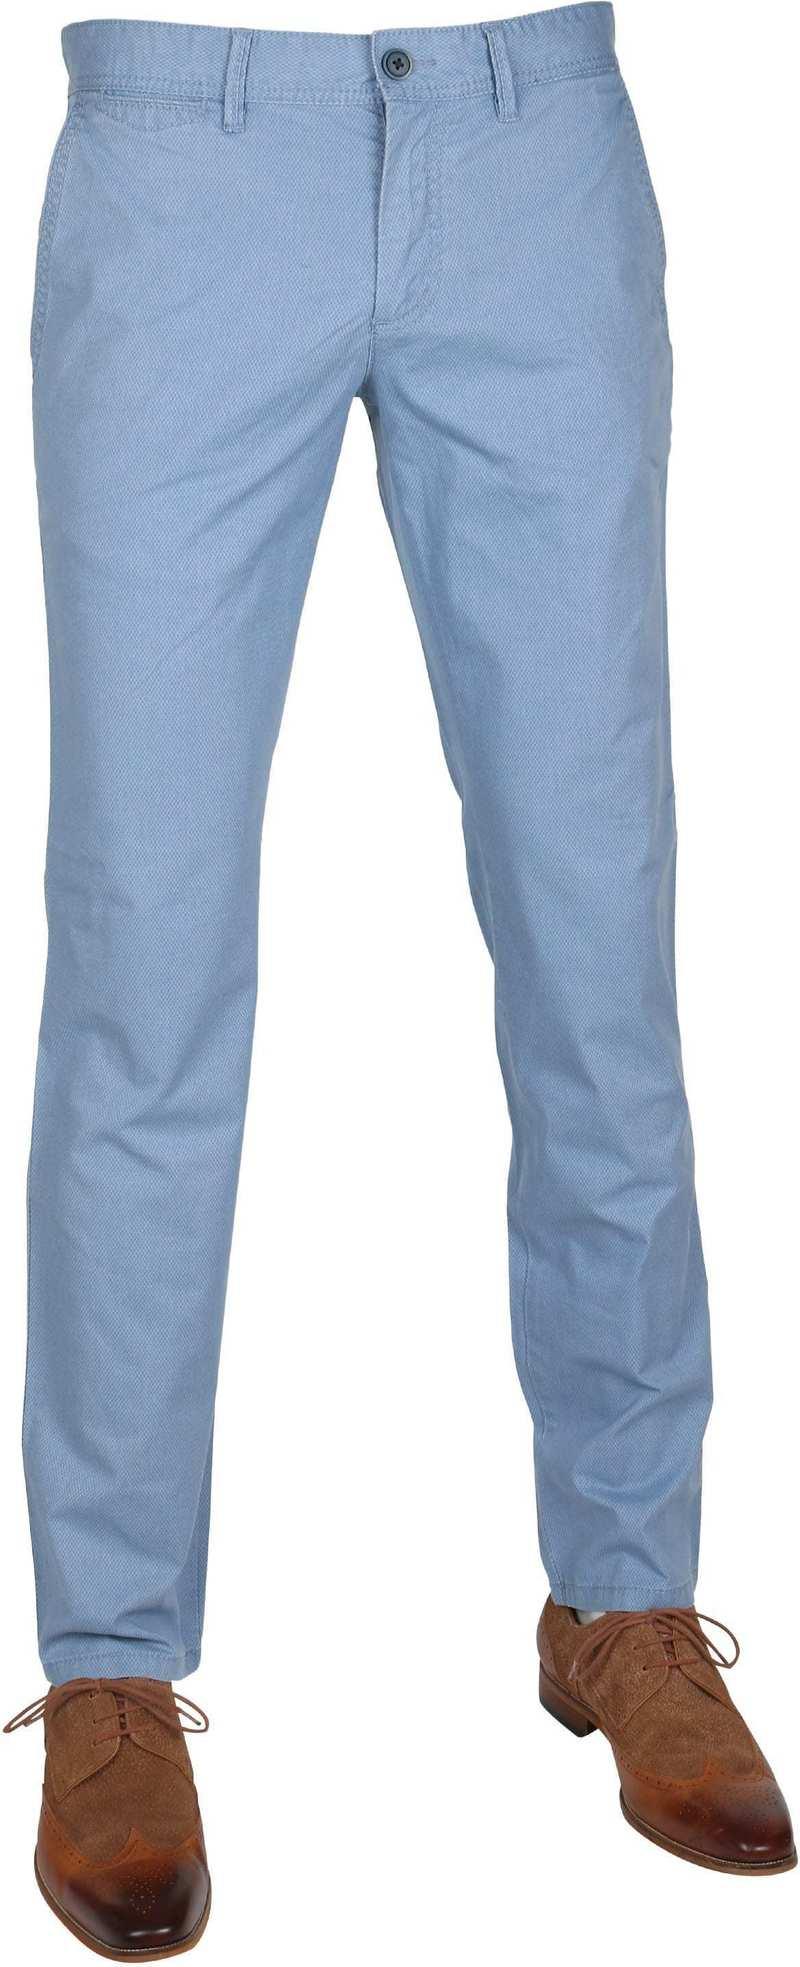 Suitable Chino Oakville Lichtblauw  online bestellen | Suitable